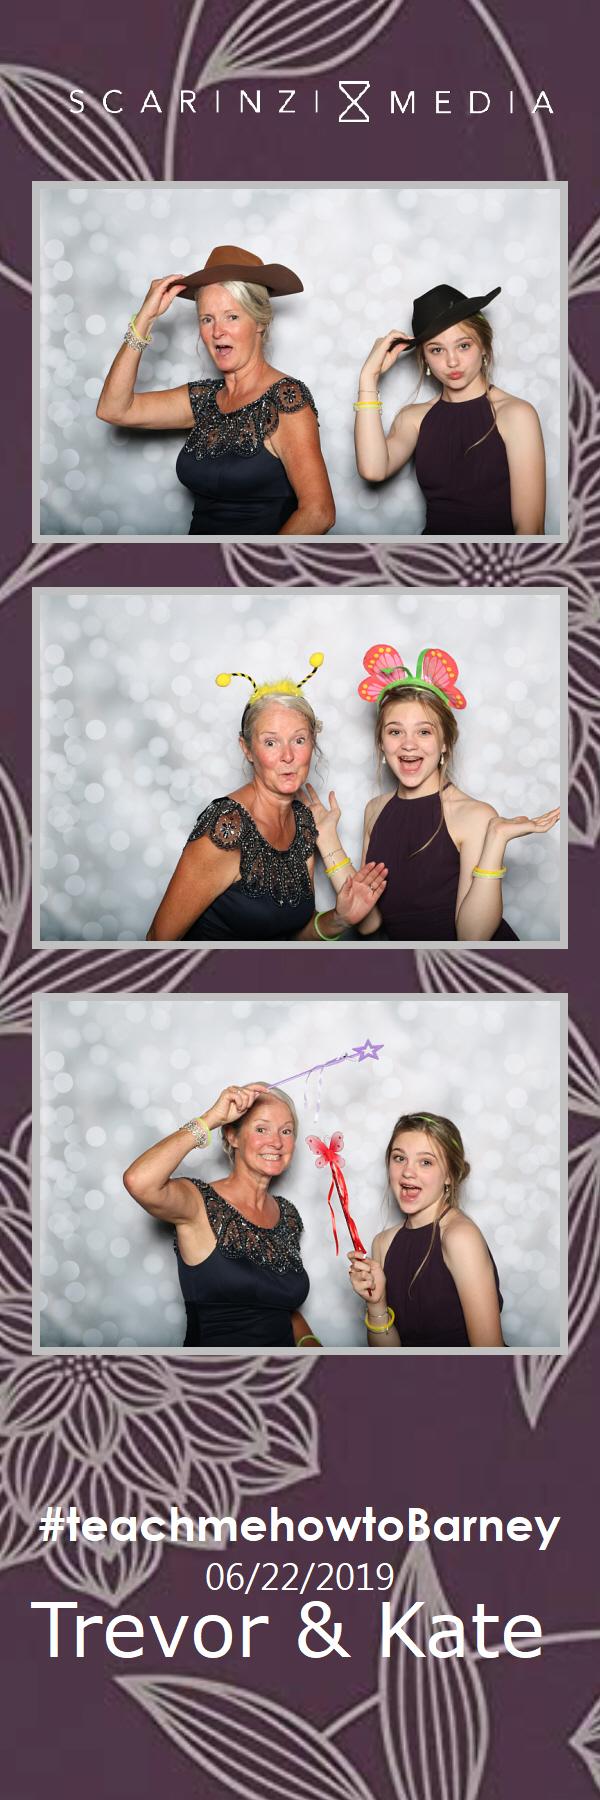 2019.06.22 - Barney Wedding PHOTOBOOTH82.jpg